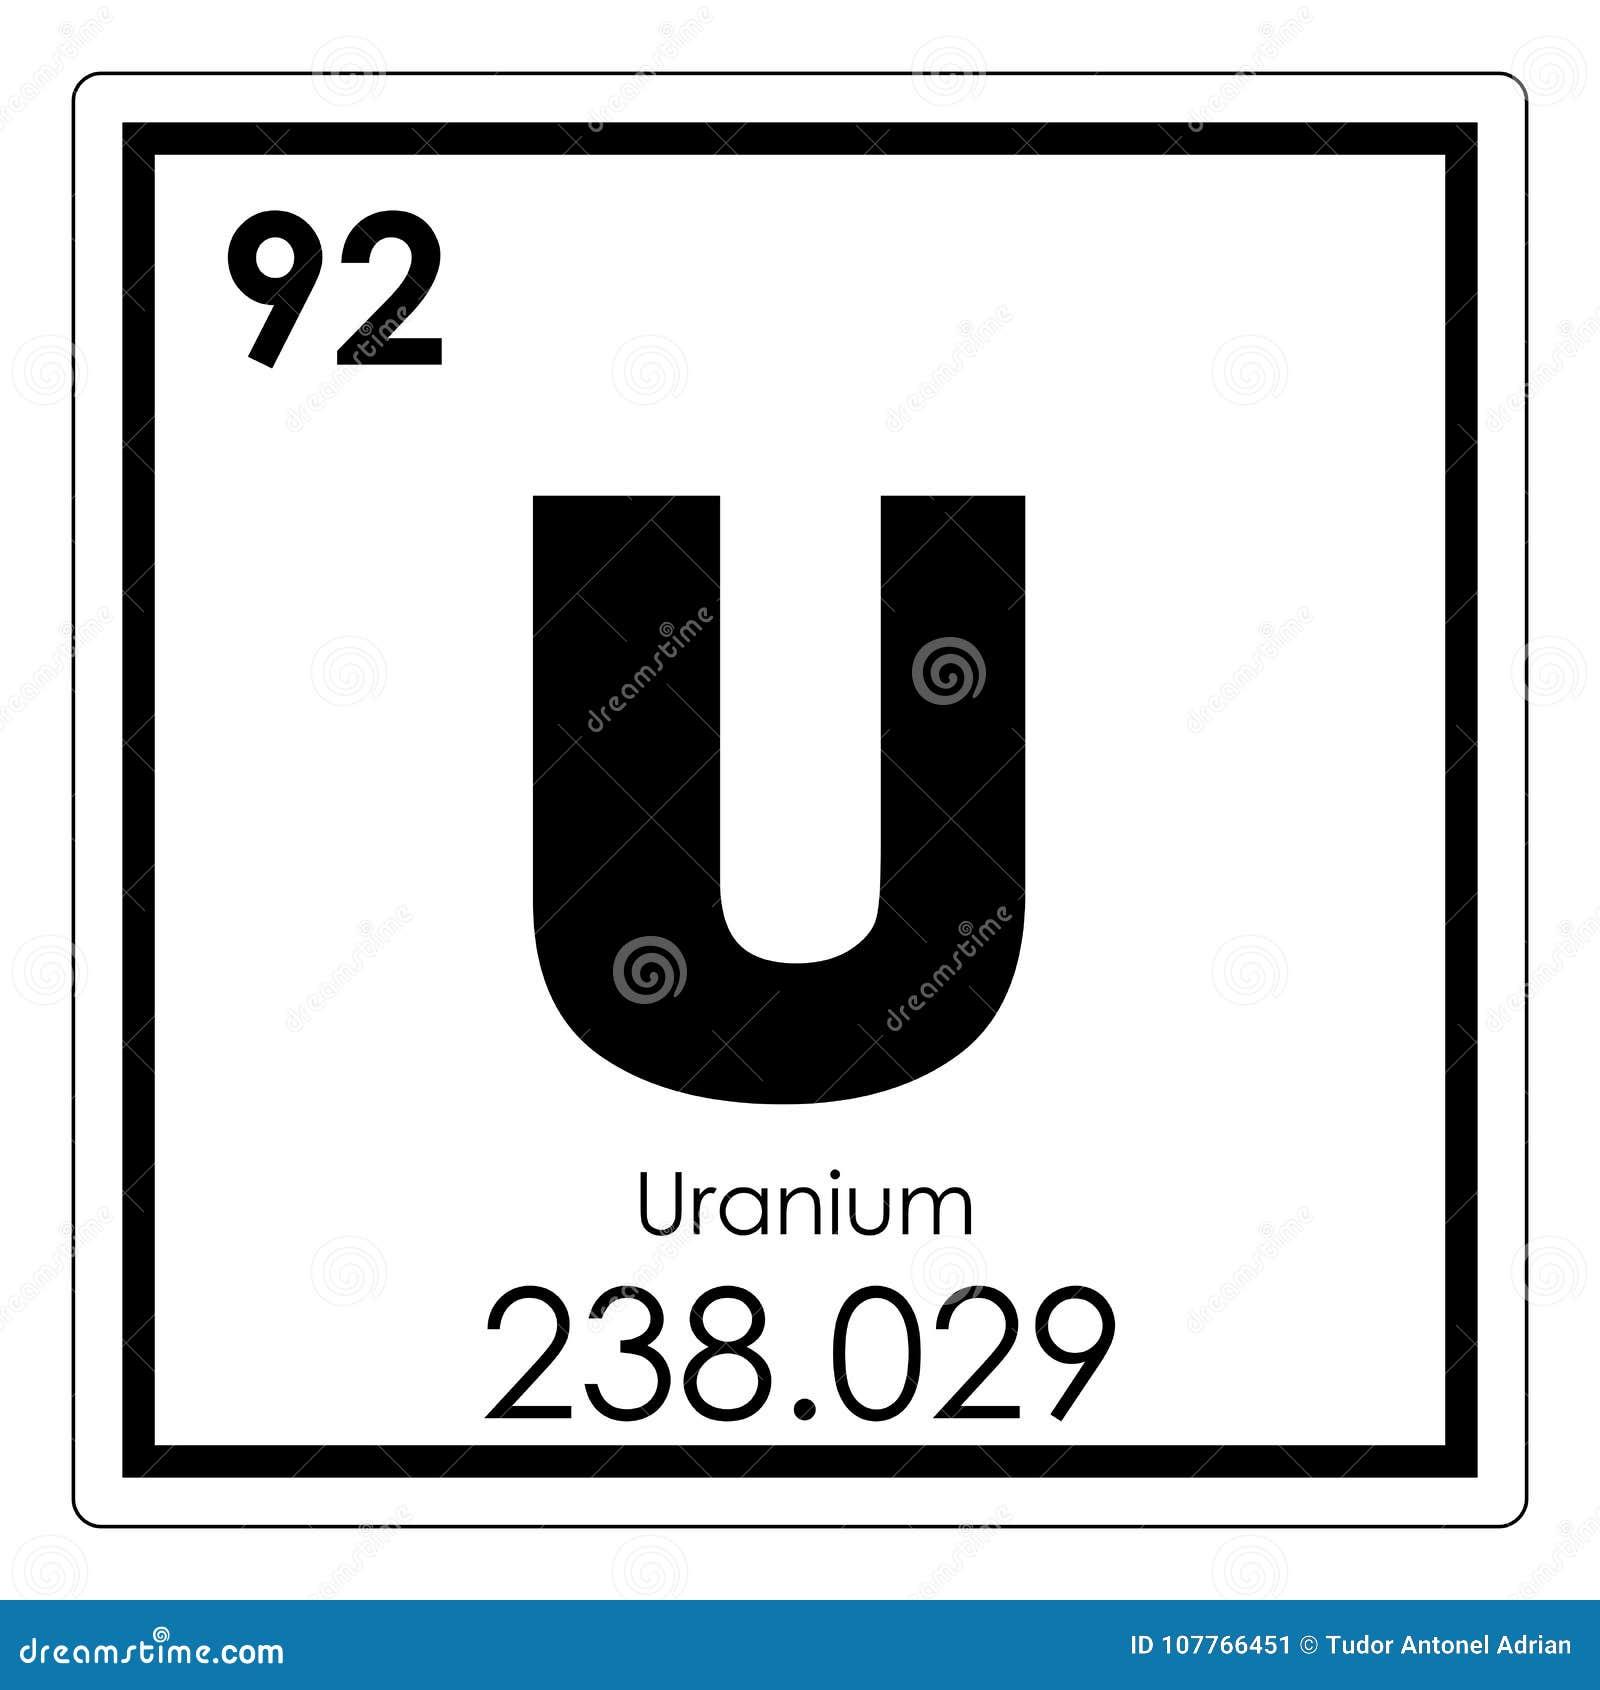 Uranium chemical element stock illustration illustration of uranium chemical element urtaz Image collections